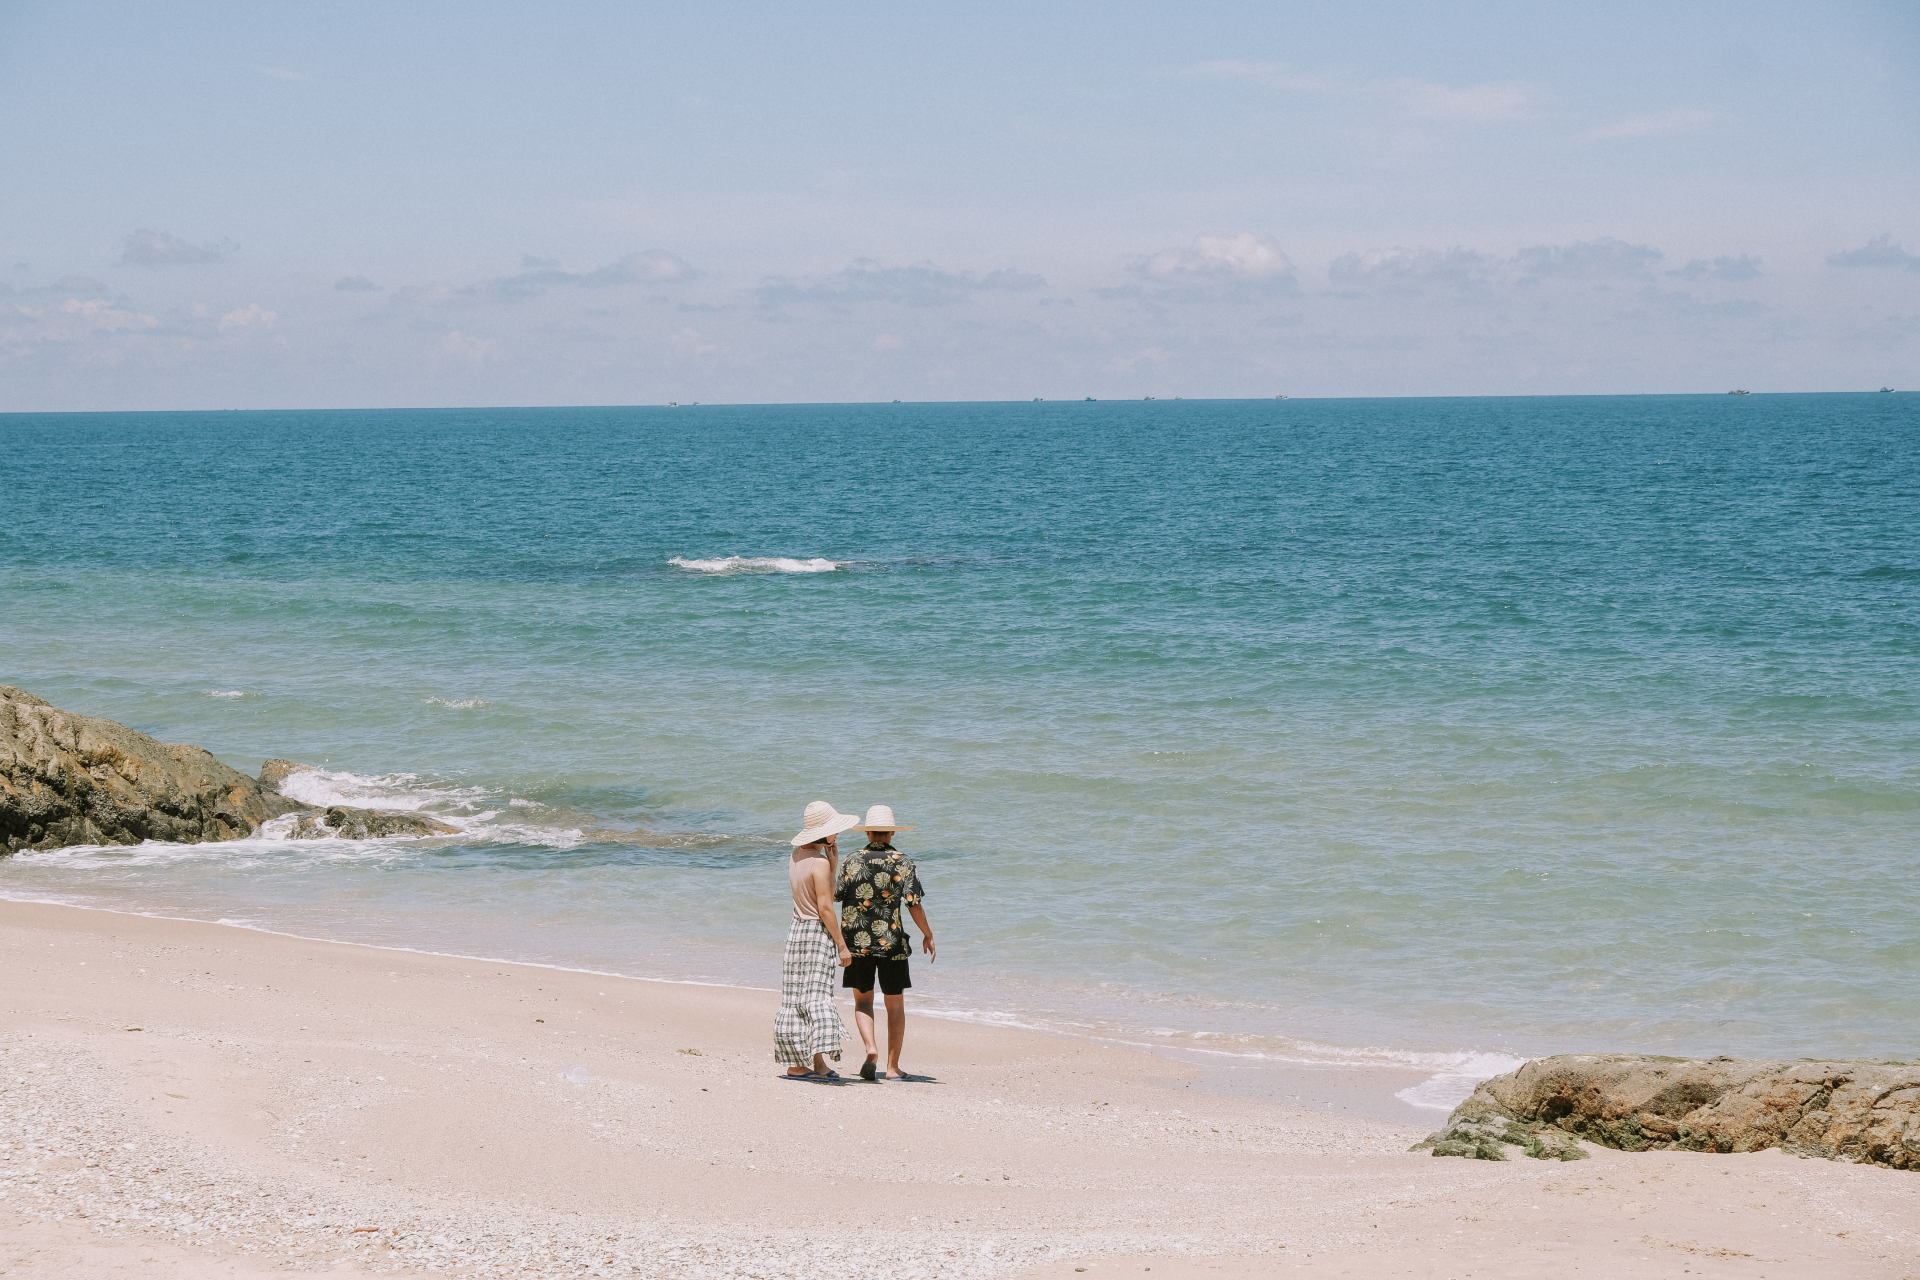 mui ne where the blue sea meets the colorful sand hills